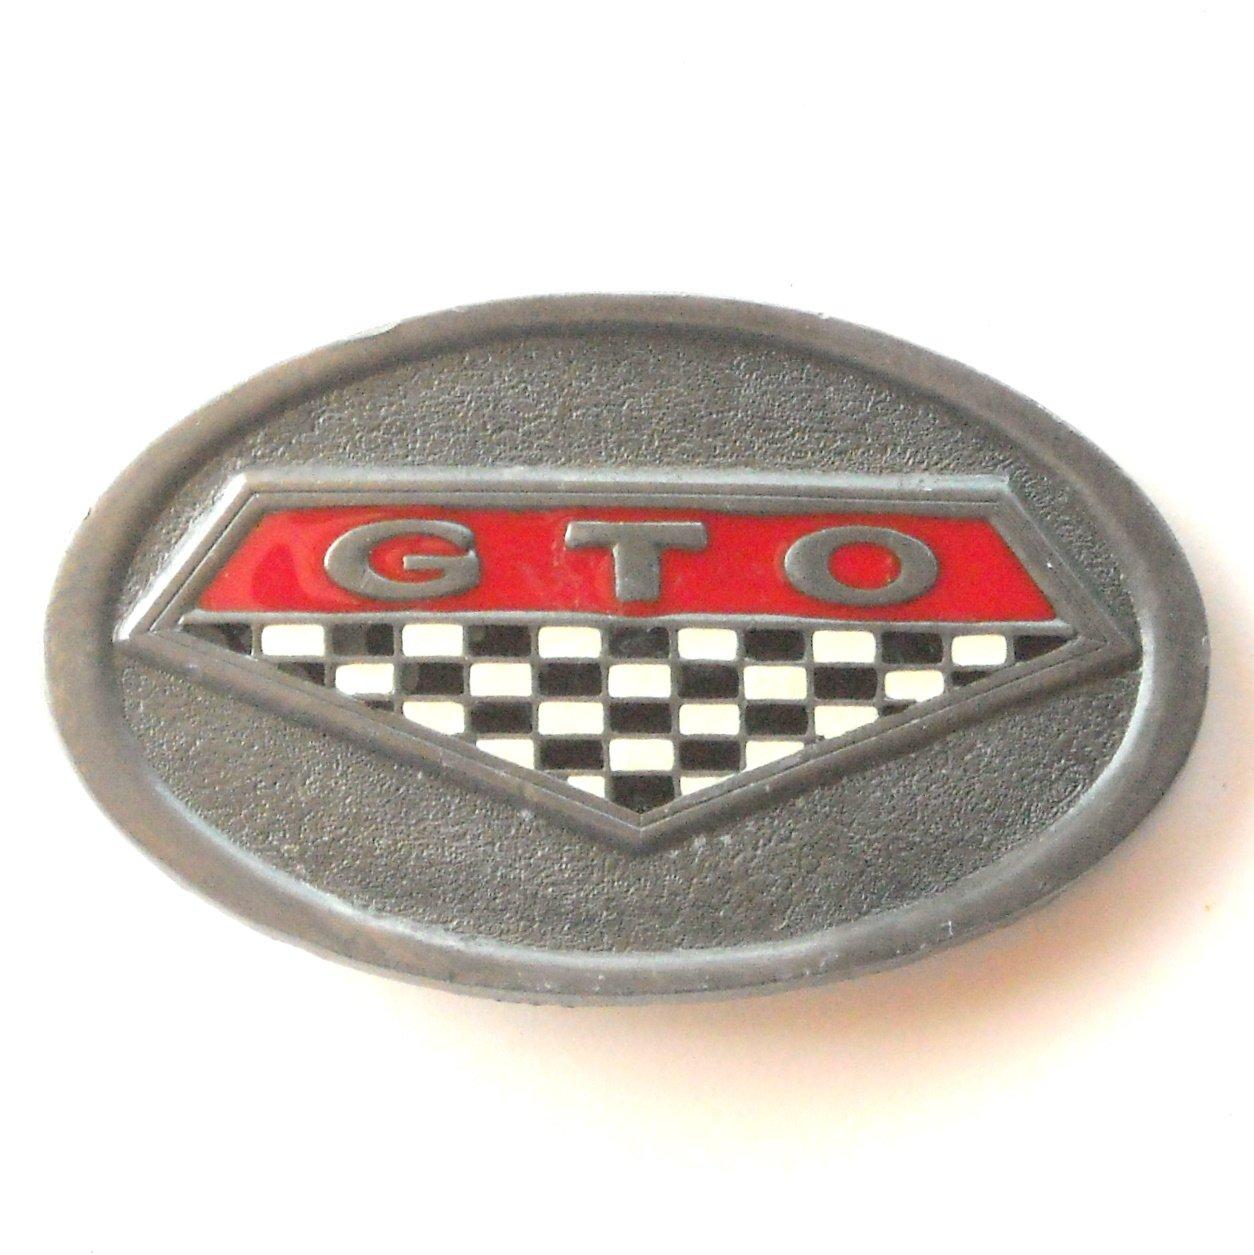 C+J 1996 Pontiac GTO C&J Inc pewter alloy belt buckle